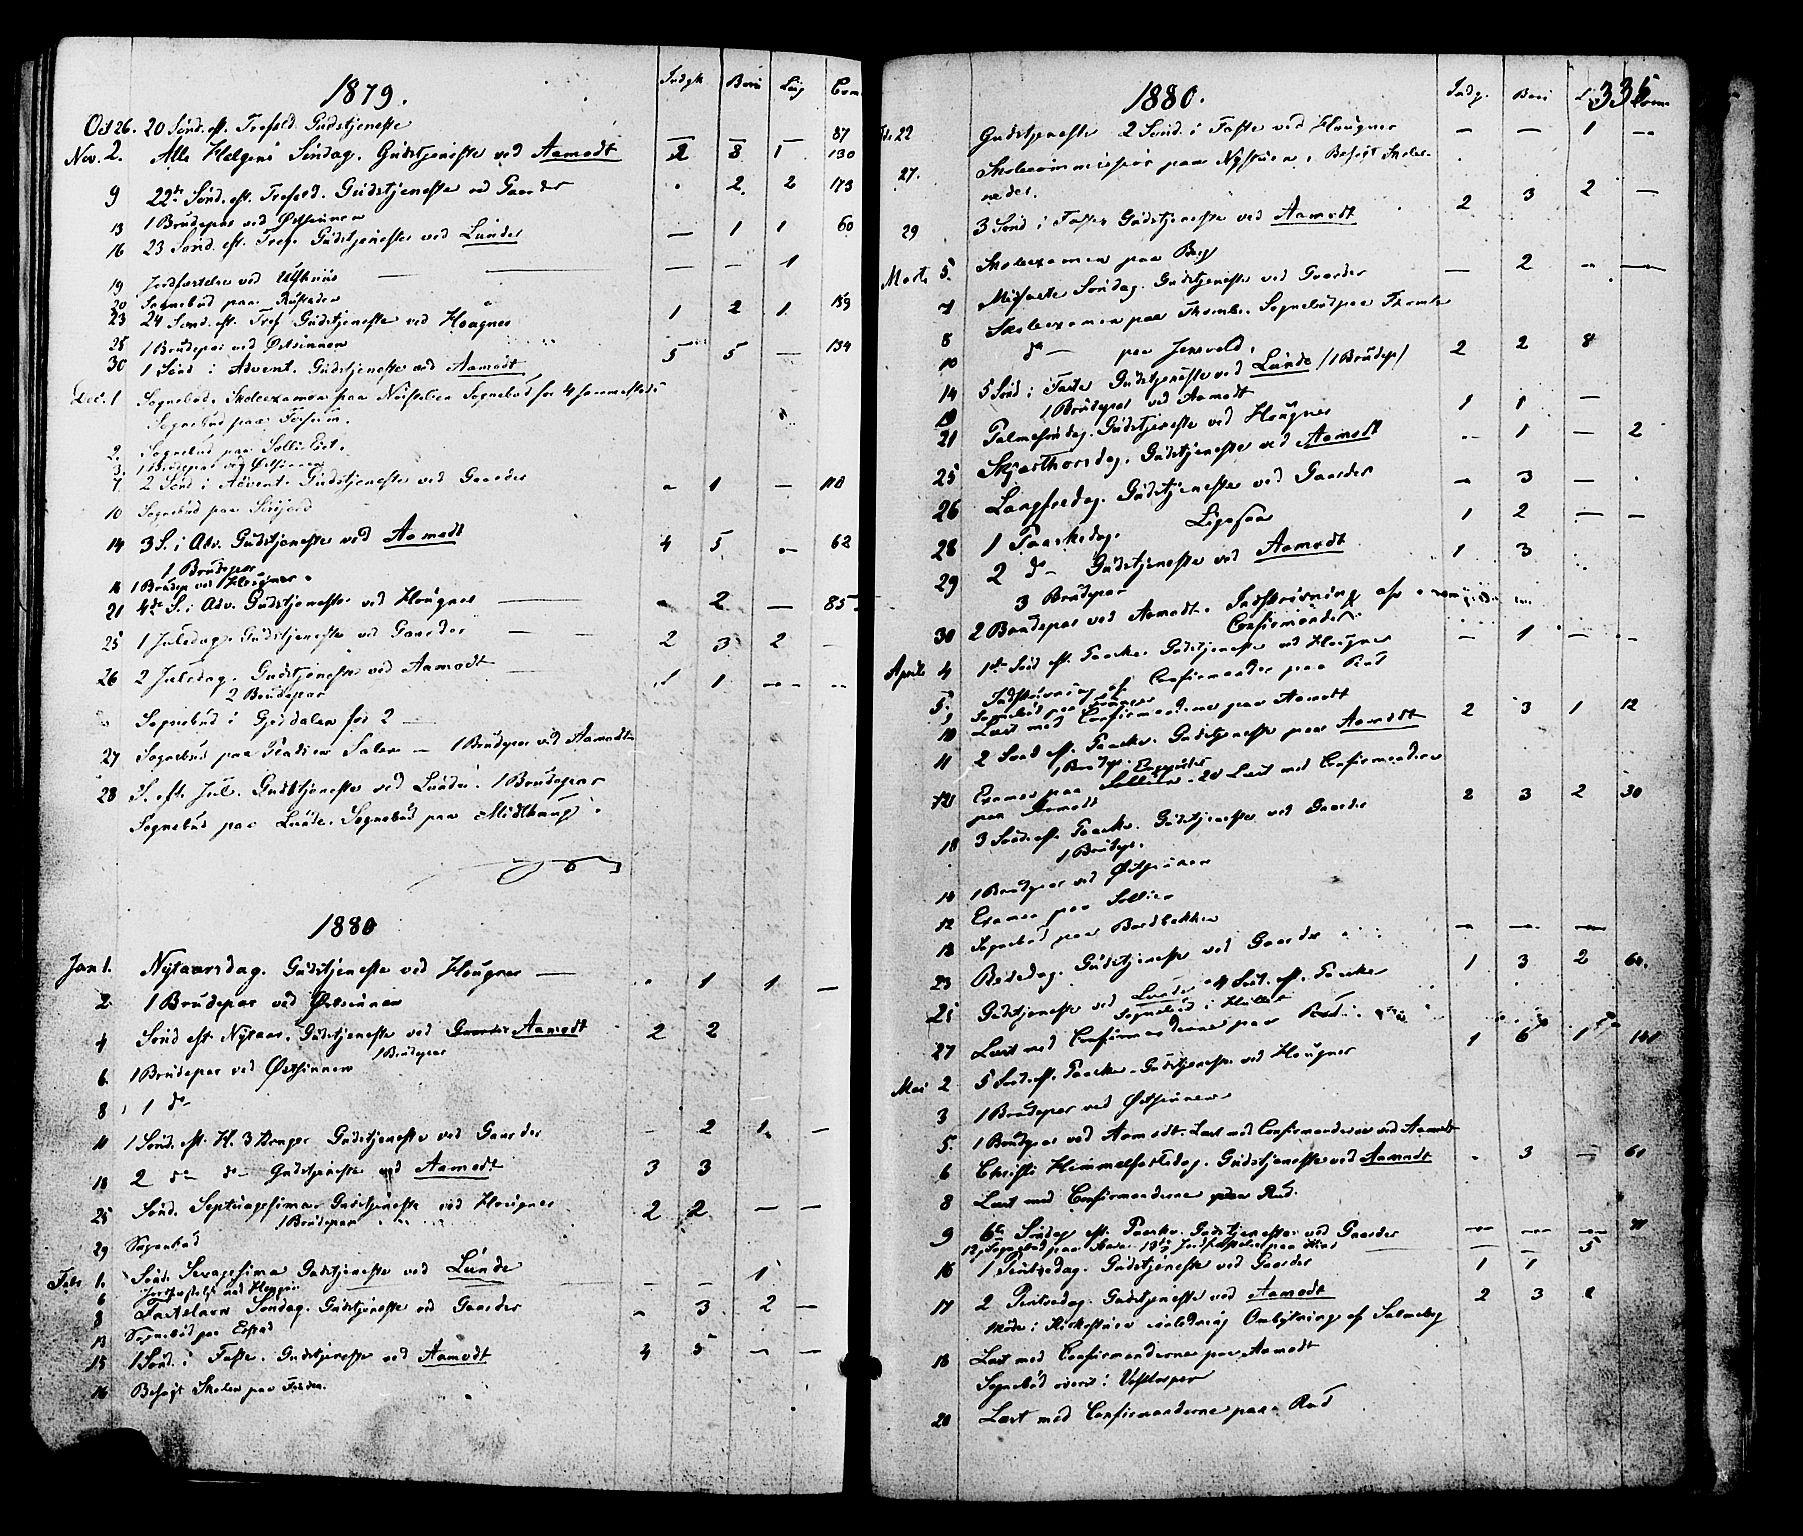 SAH, Nordre Land prestekontor, Ministerialbok nr. 2, 1872-1881, s. 335